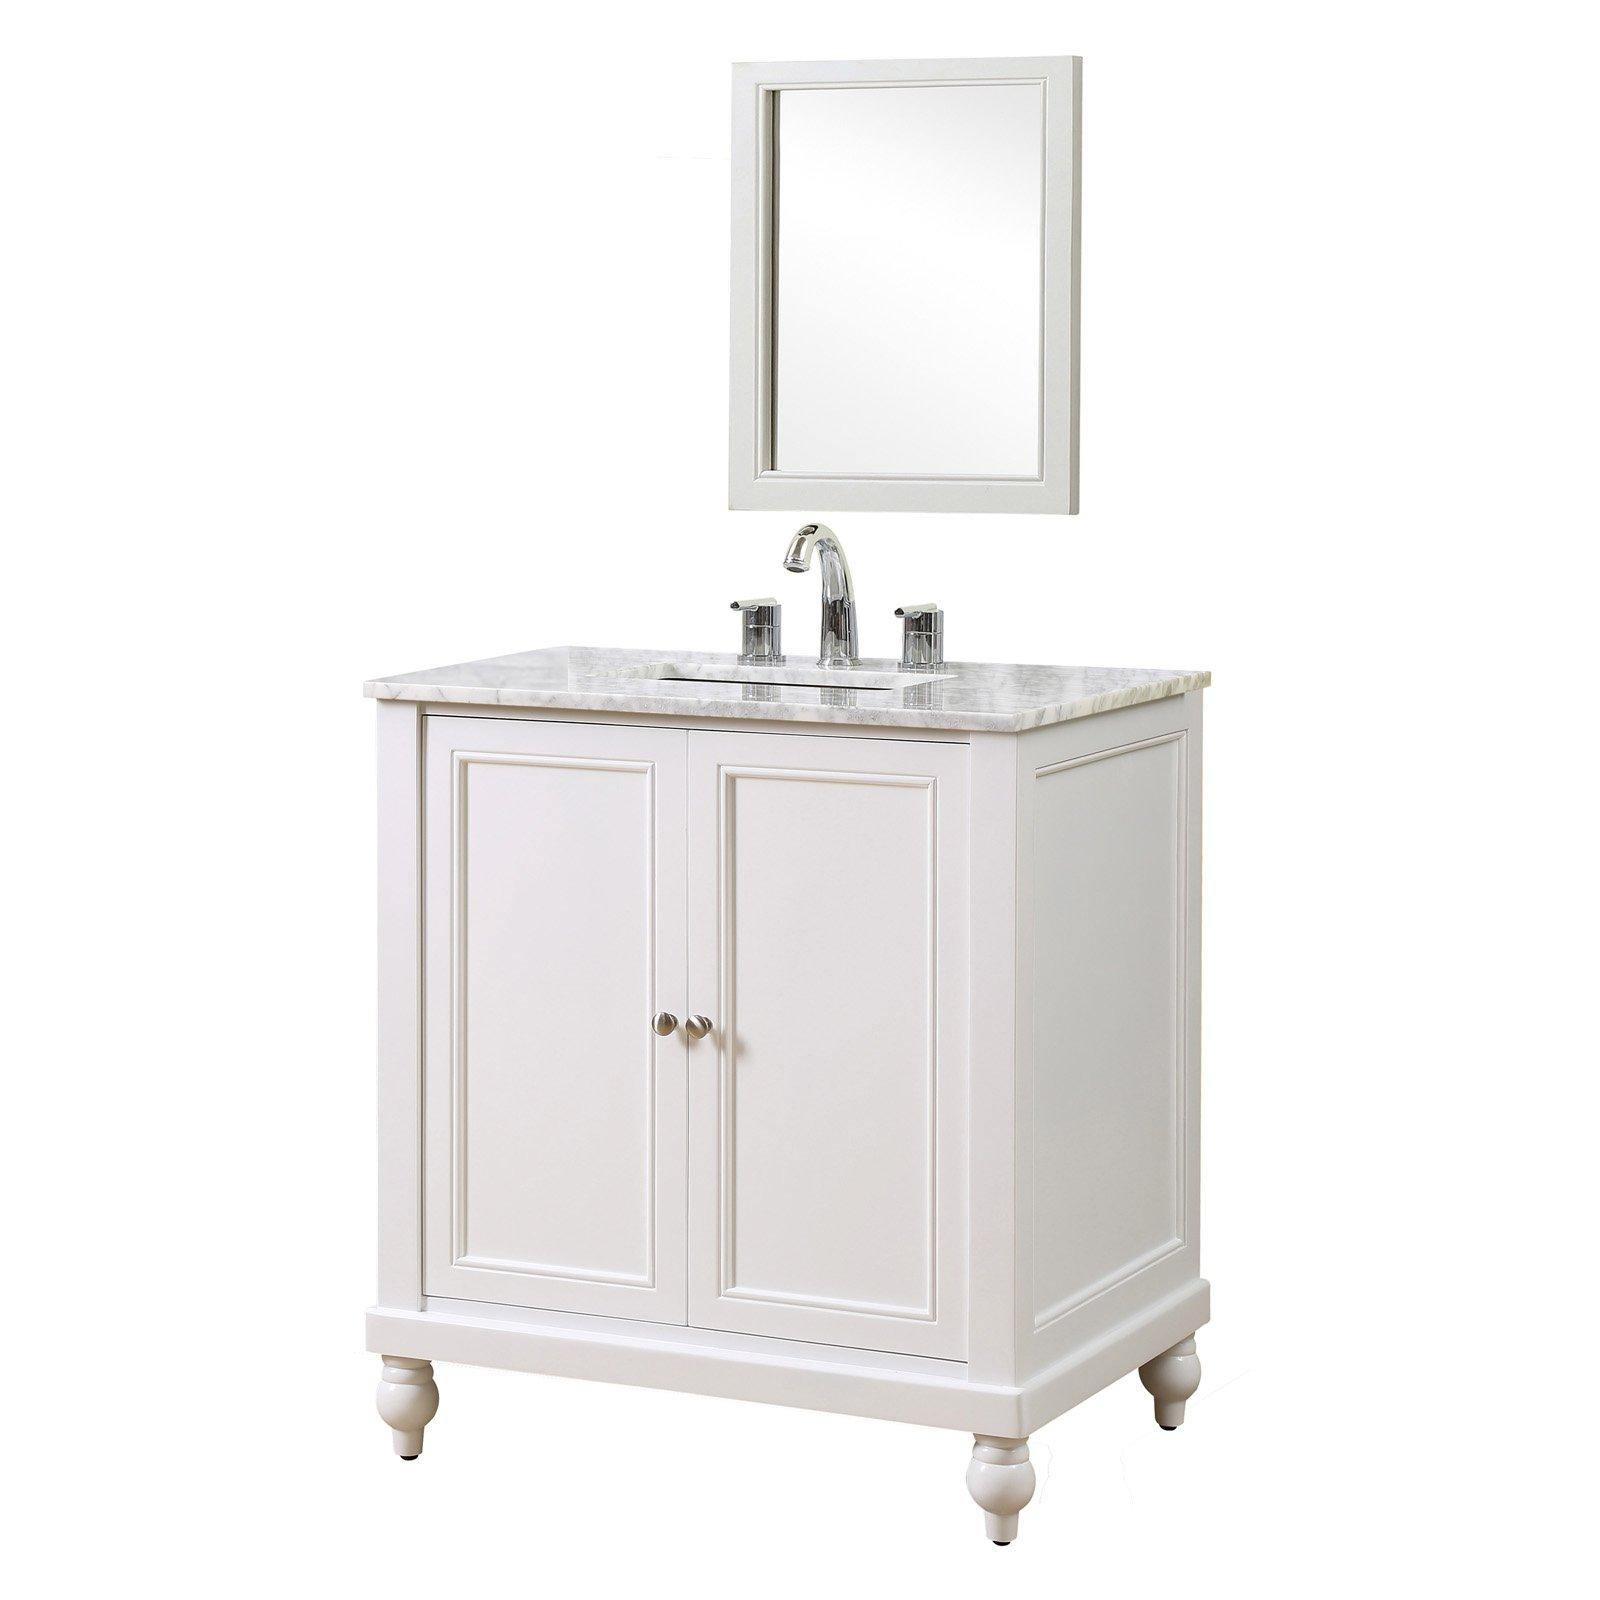 J And J International Classic 32 In Single Bathroom Vanity Black